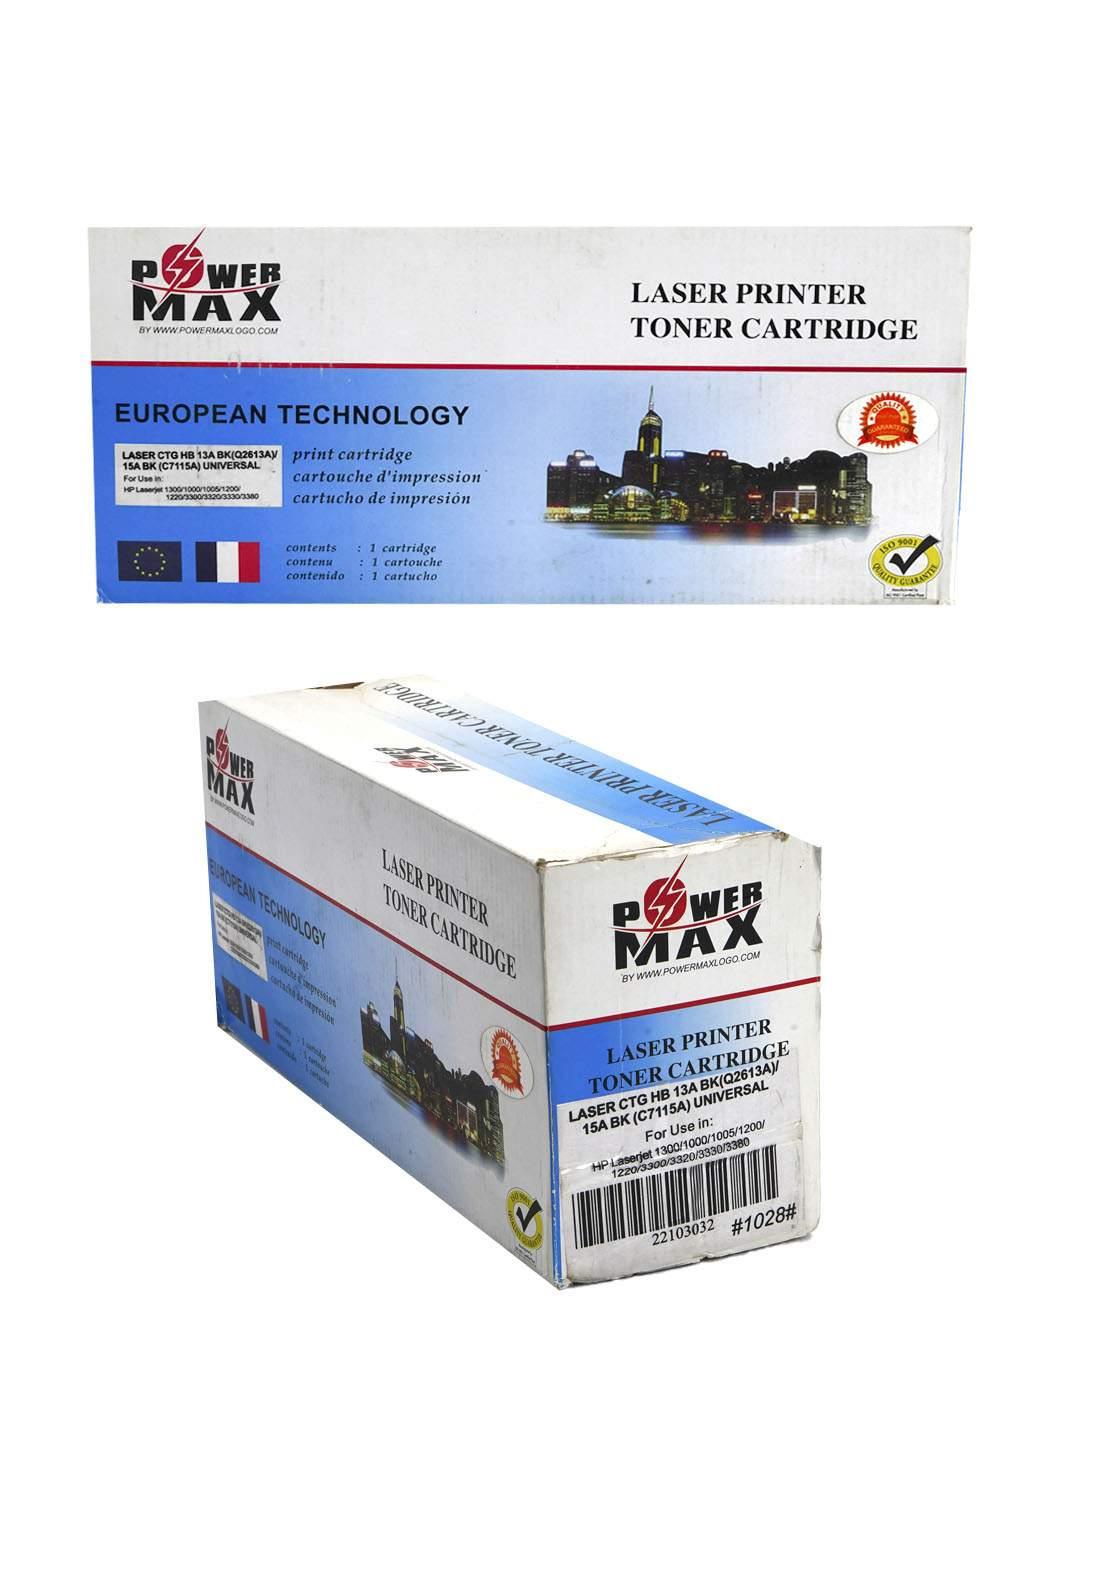 Power Max CTG HB 13A (Q2613A)/15A (C7115A) Laser Printer Toner Cartridge خرطوشة حبر